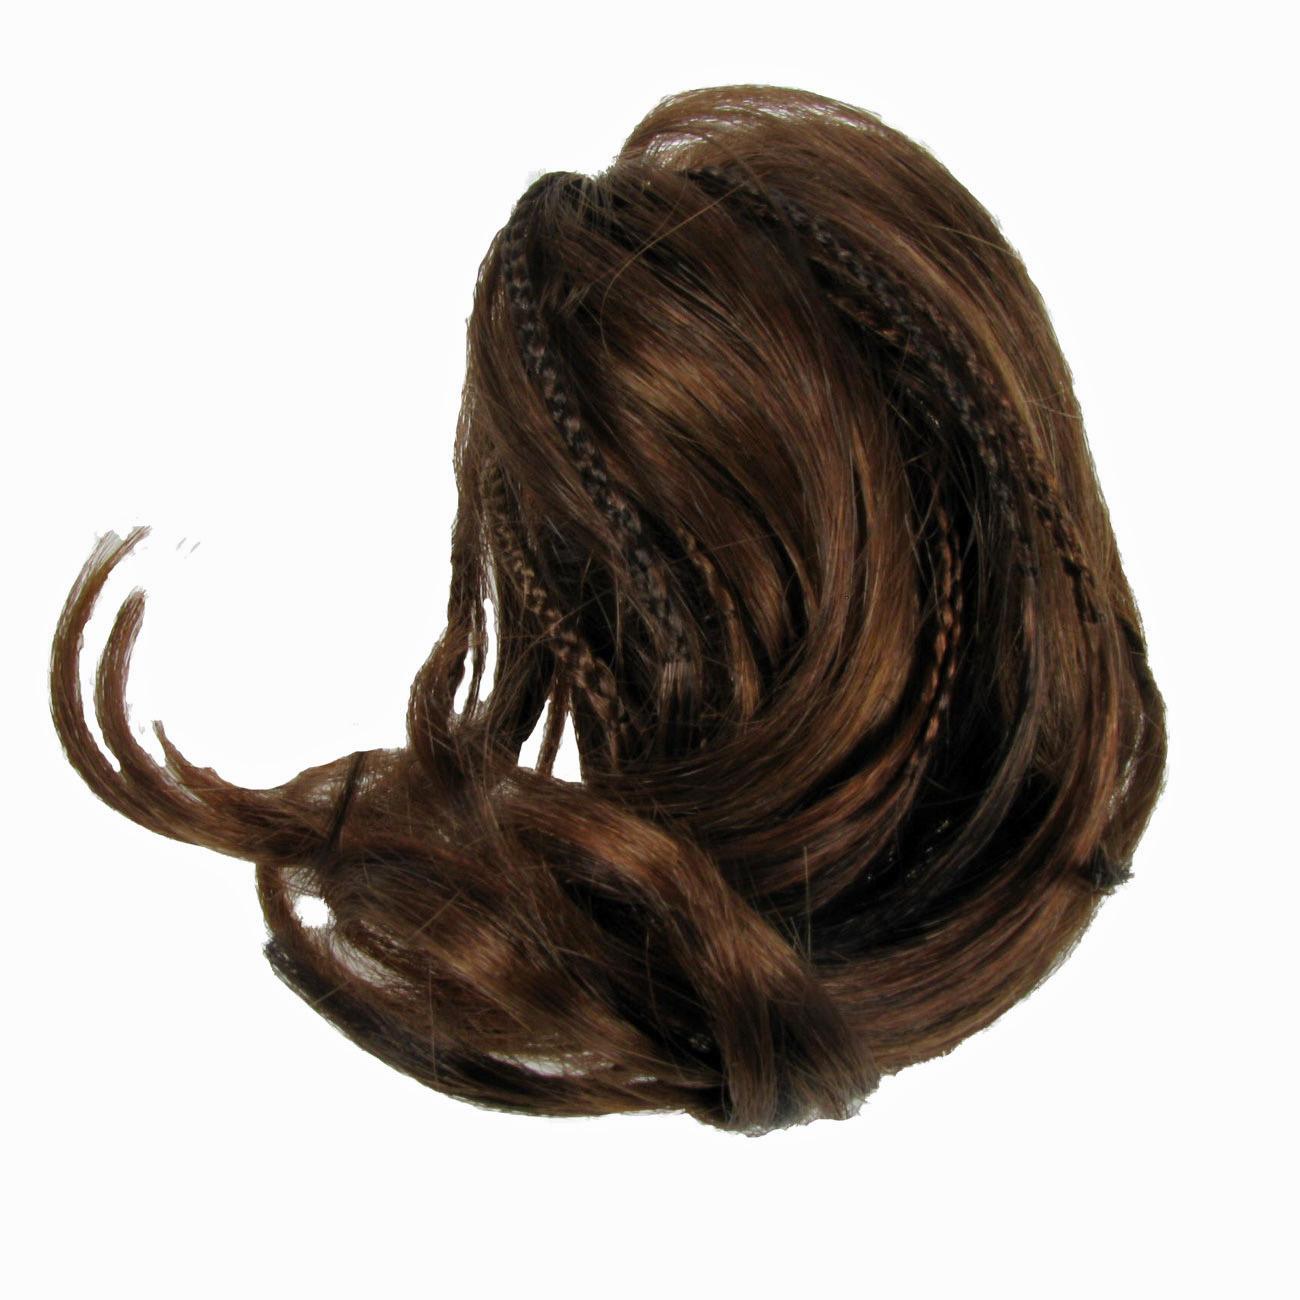 Hair Piece Extension Bun Auburn Synthetic Elasticated Band Curly